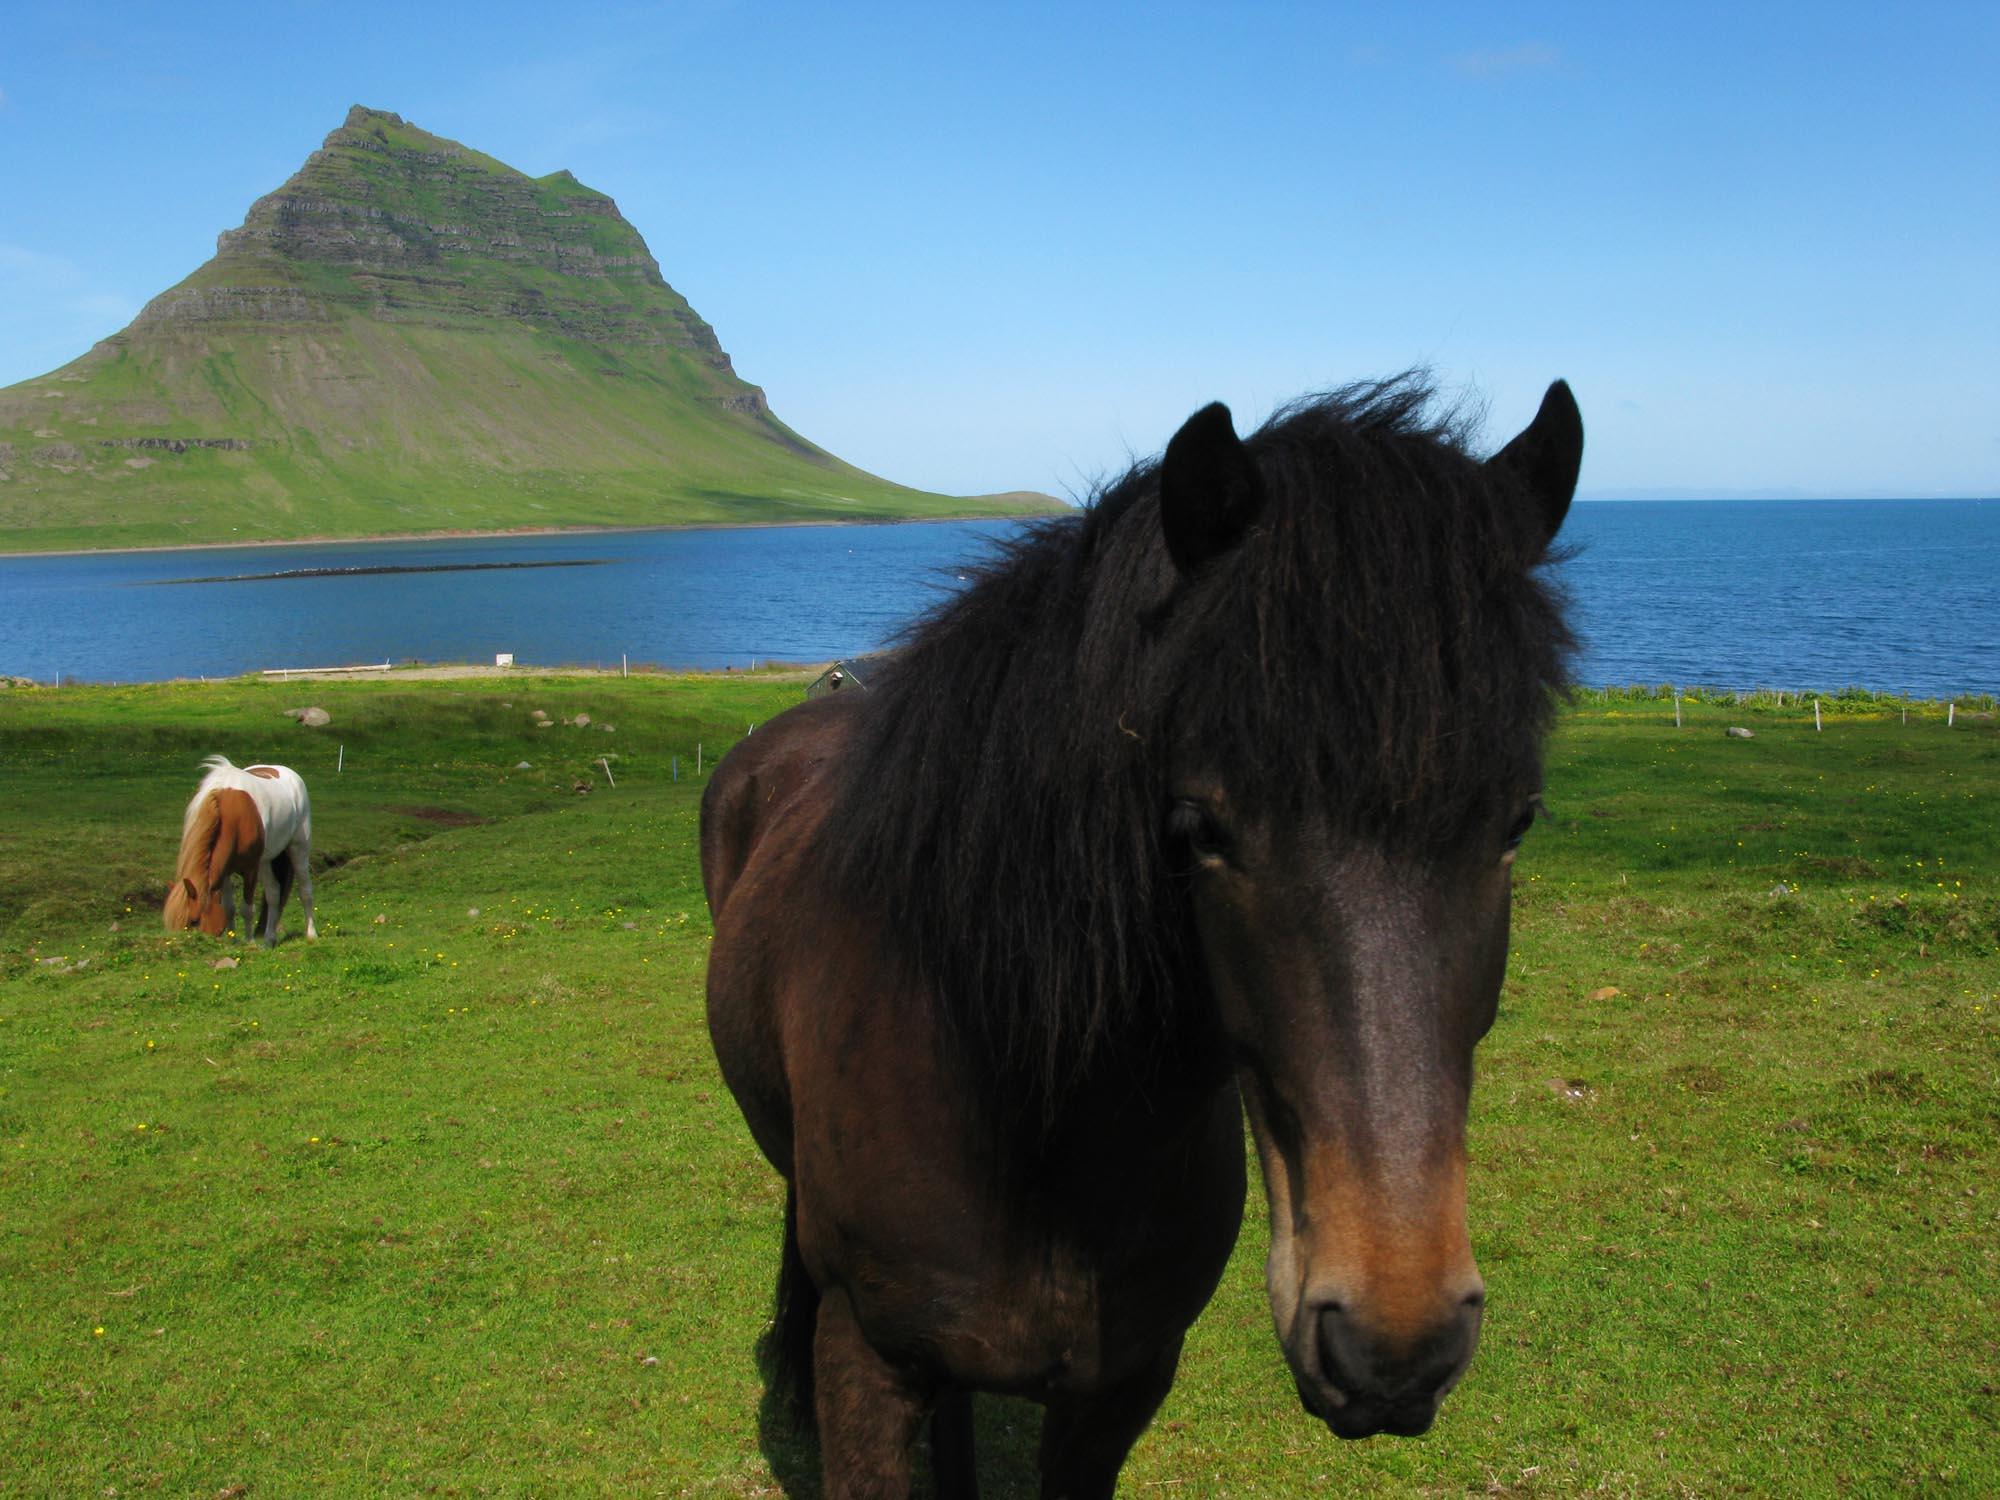 island-pferd-small